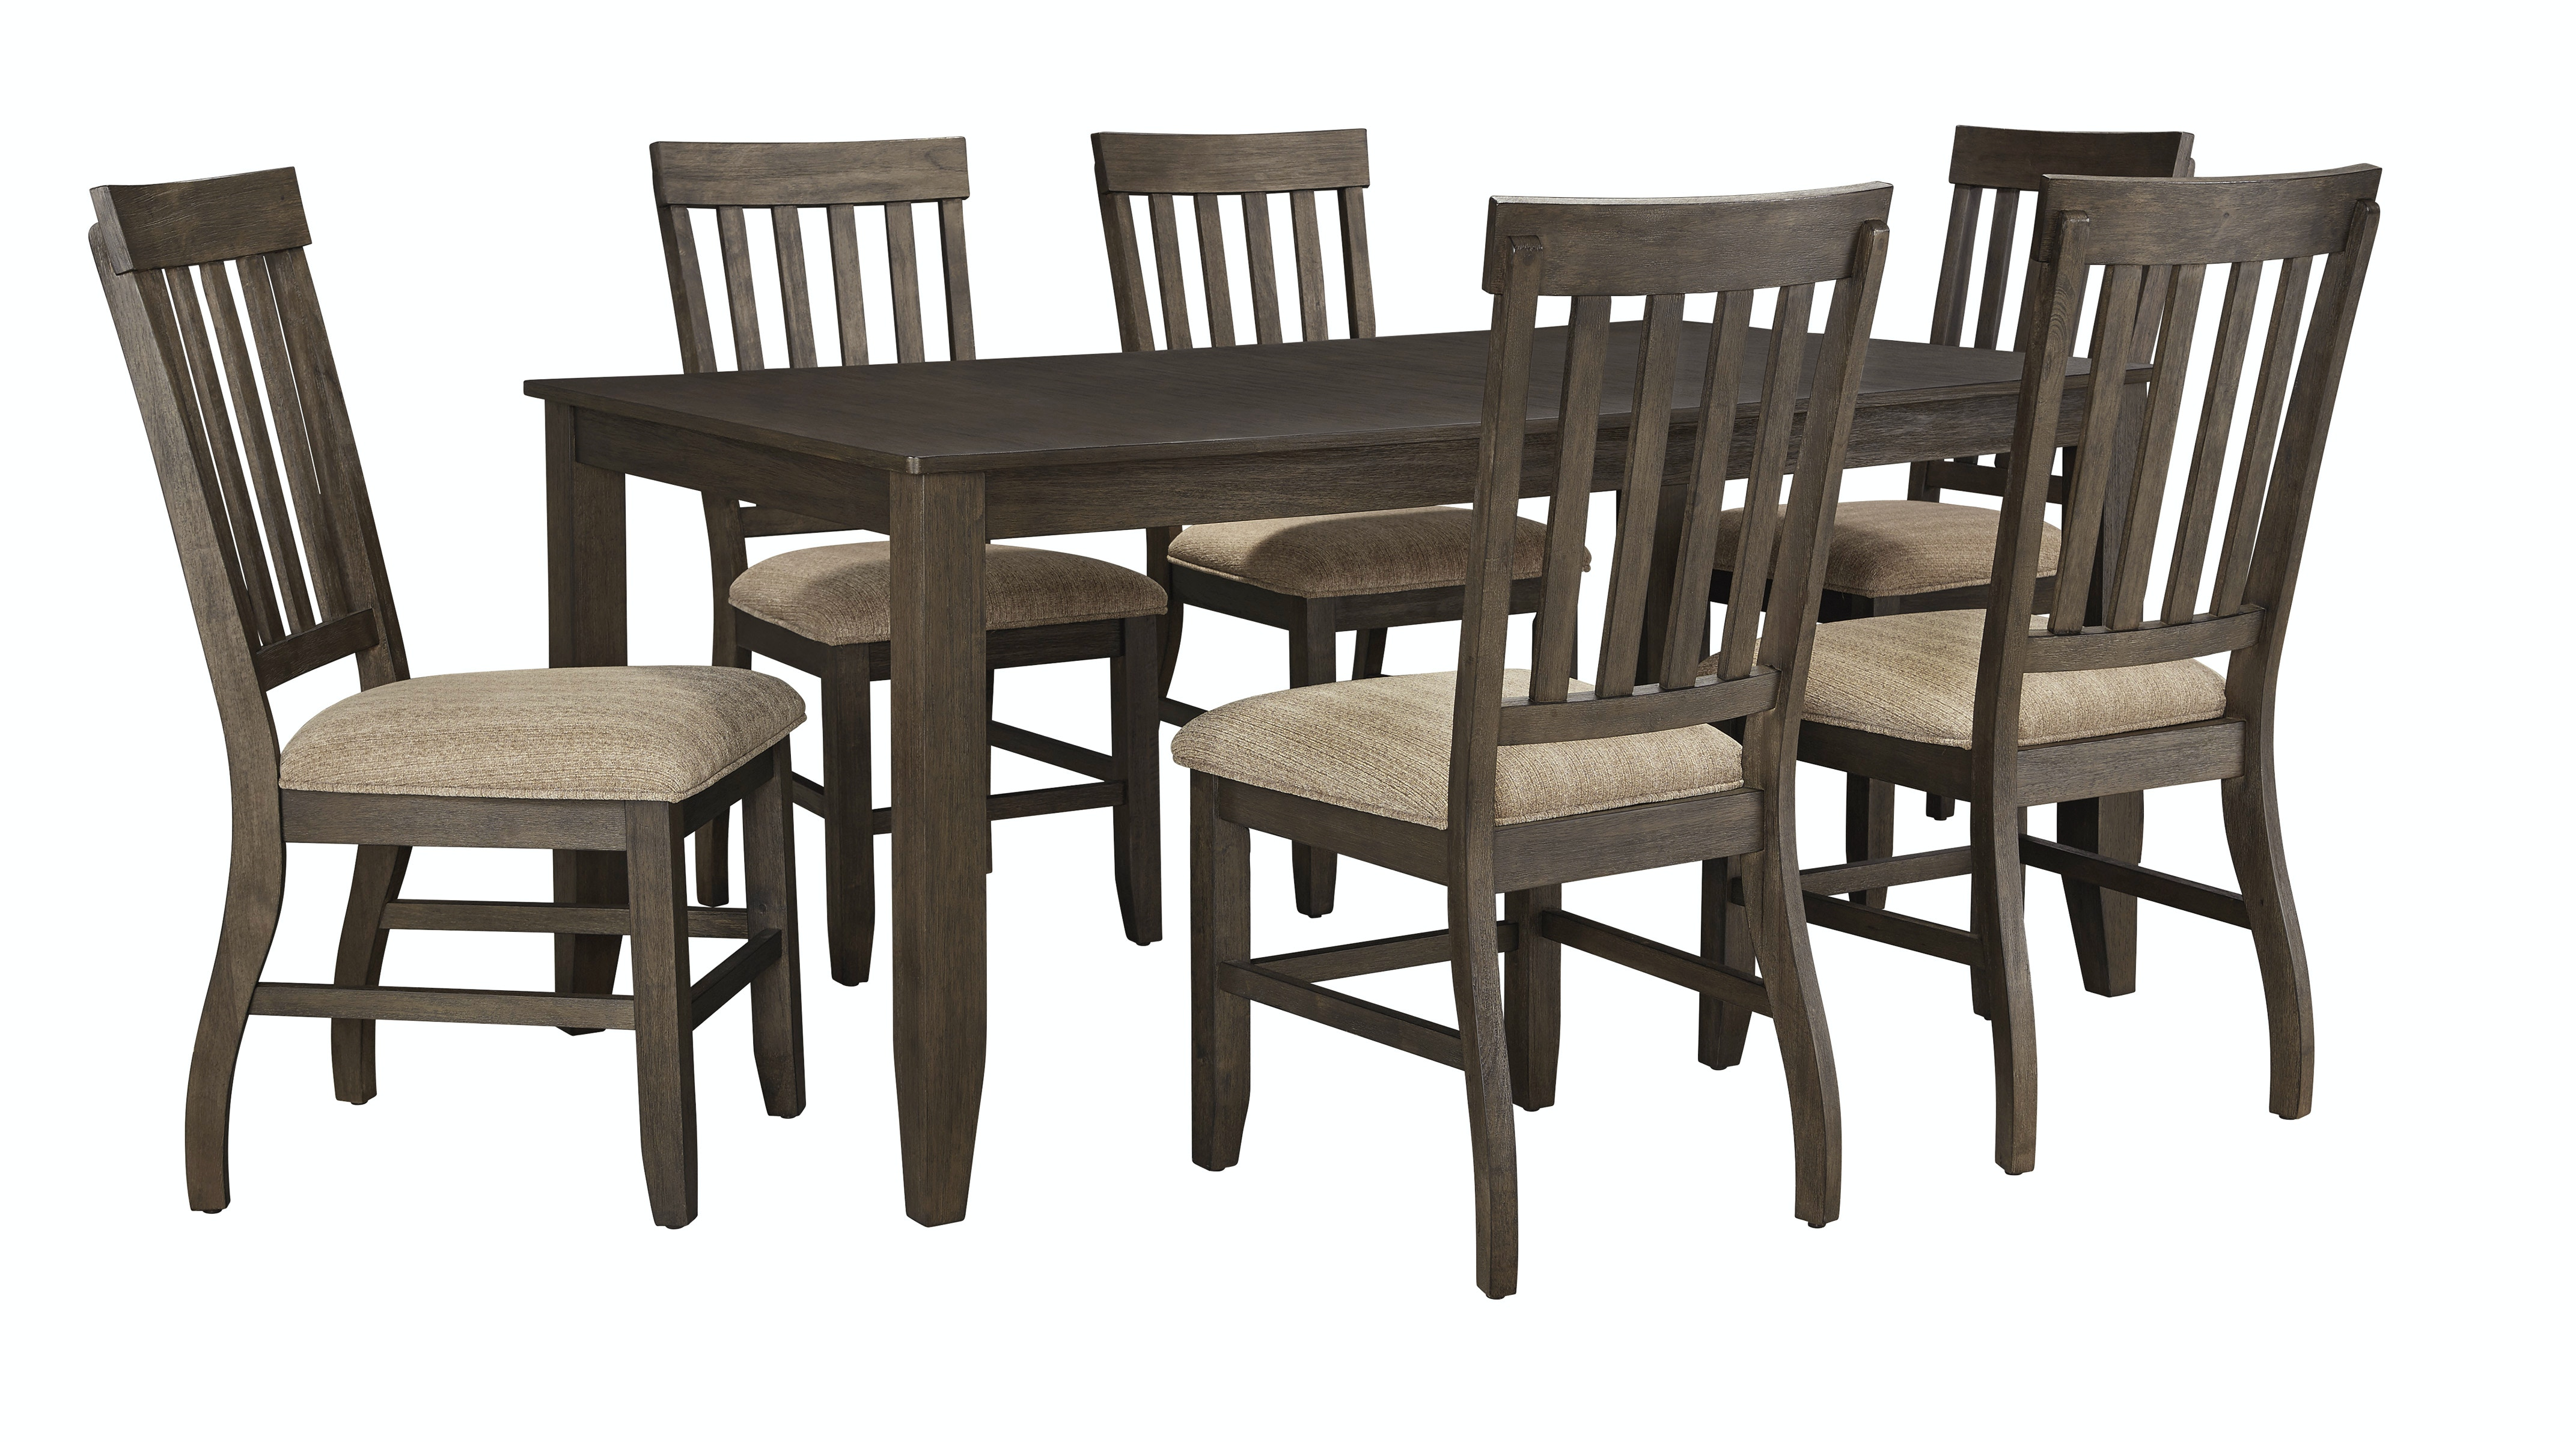 Marvelous Ashley Dresbar 7pc Pub Dining Room Set D485 Tbl/6 Chairs